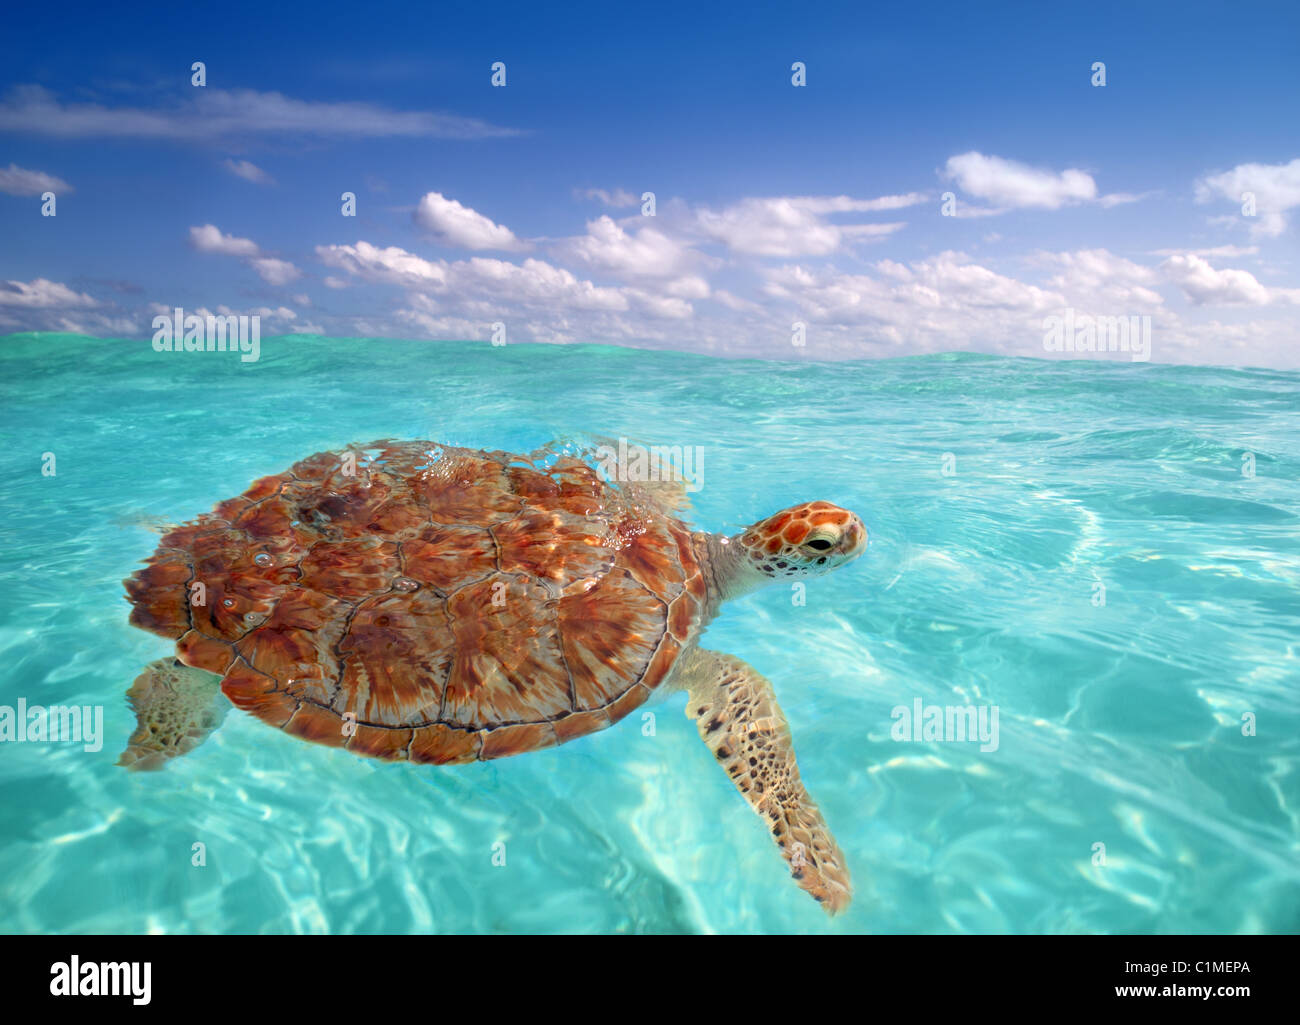 Tartaruga Verde Chelonia Mydas Mar dei Caraibi famiglia Cheloniidae superficie di acqua Immagini Stock